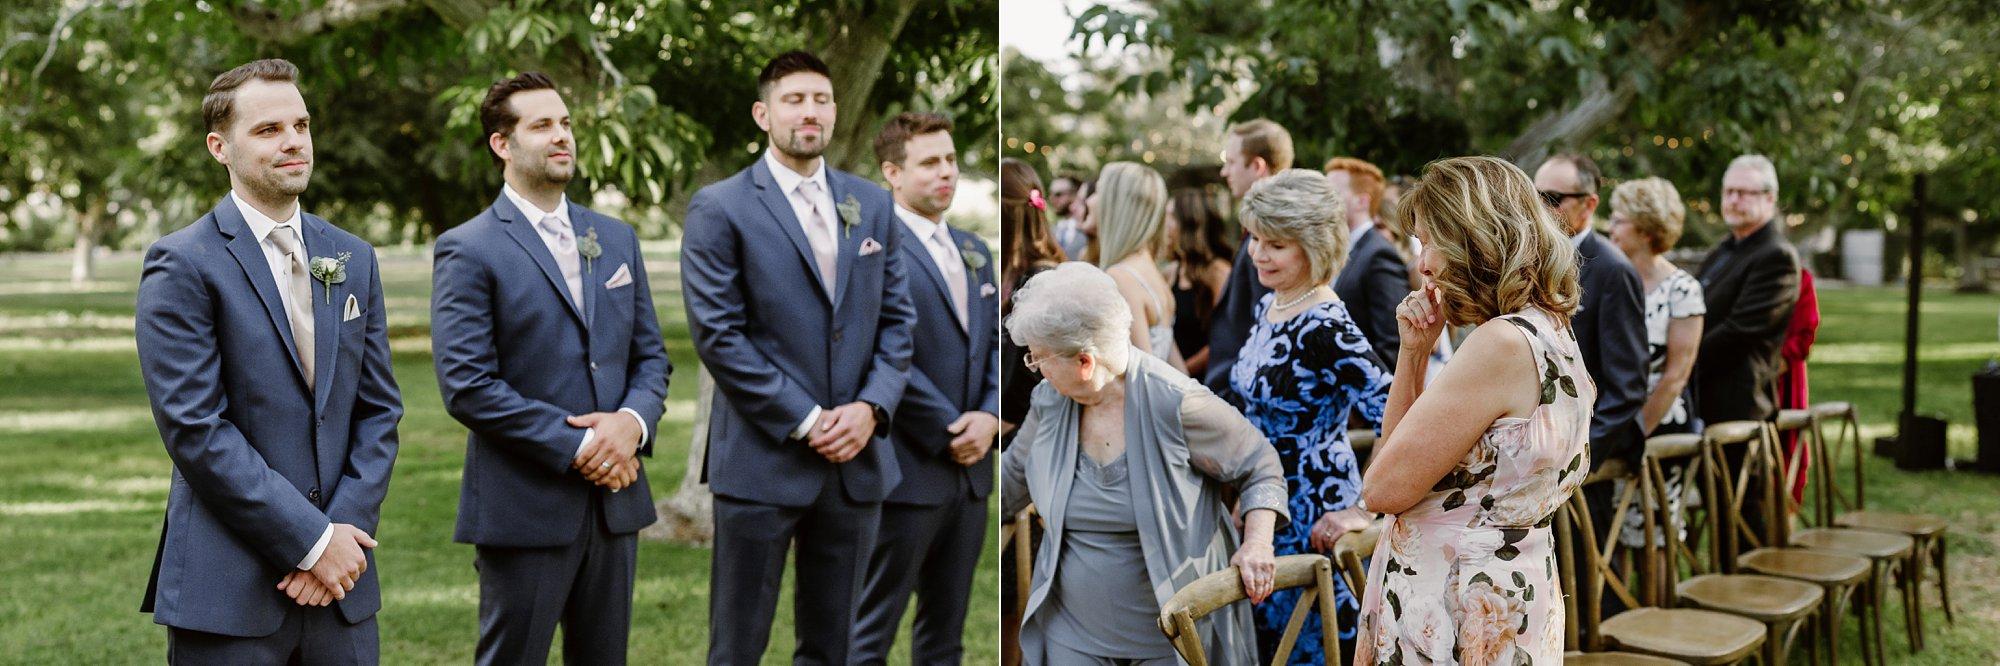 Walnut Grove Moorpark California Wedding_0023.jpg